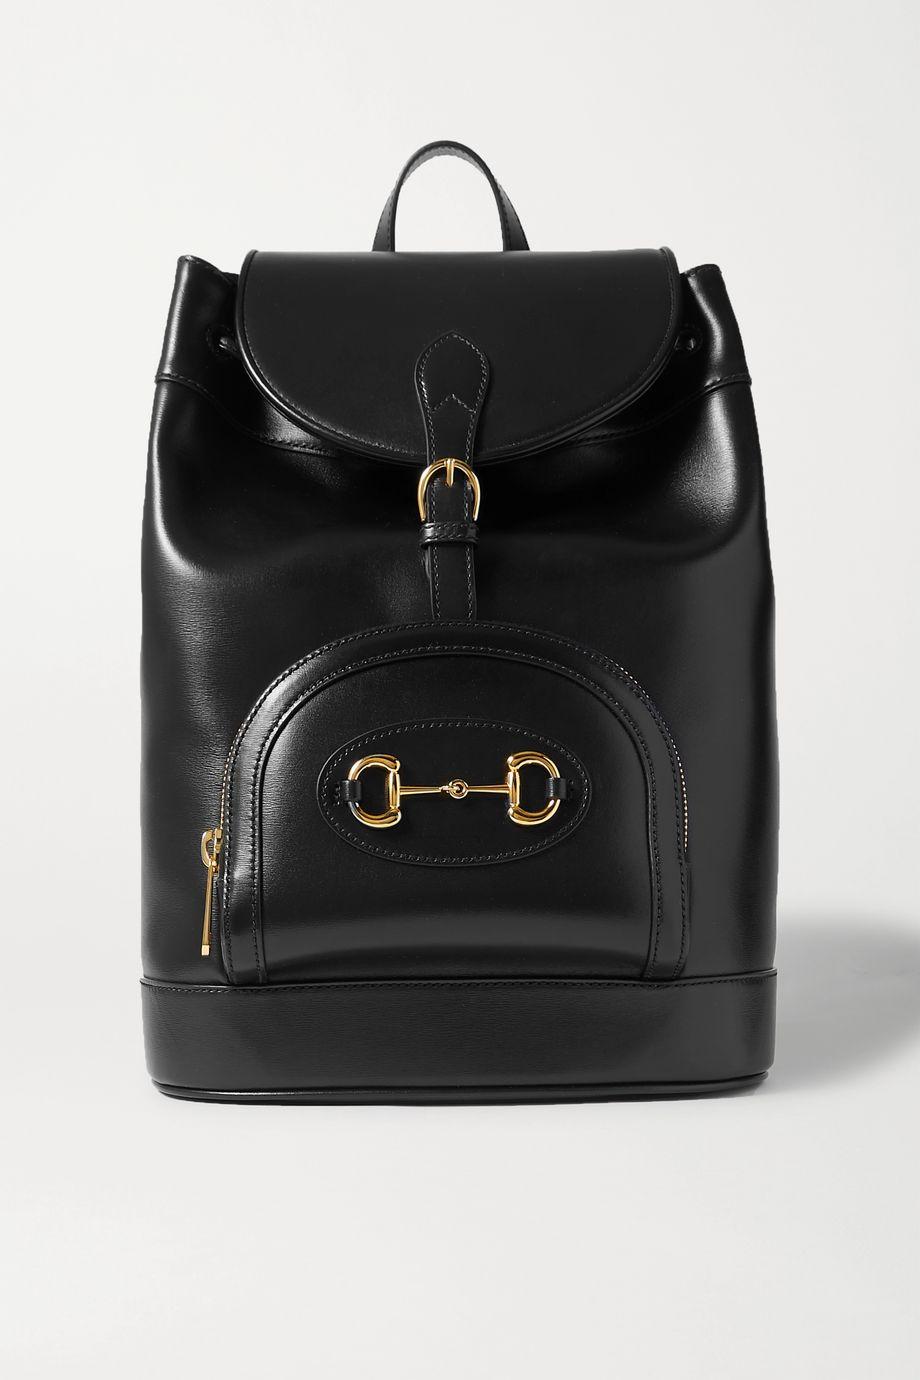 Gucci 1955 Horsebit leather backpack